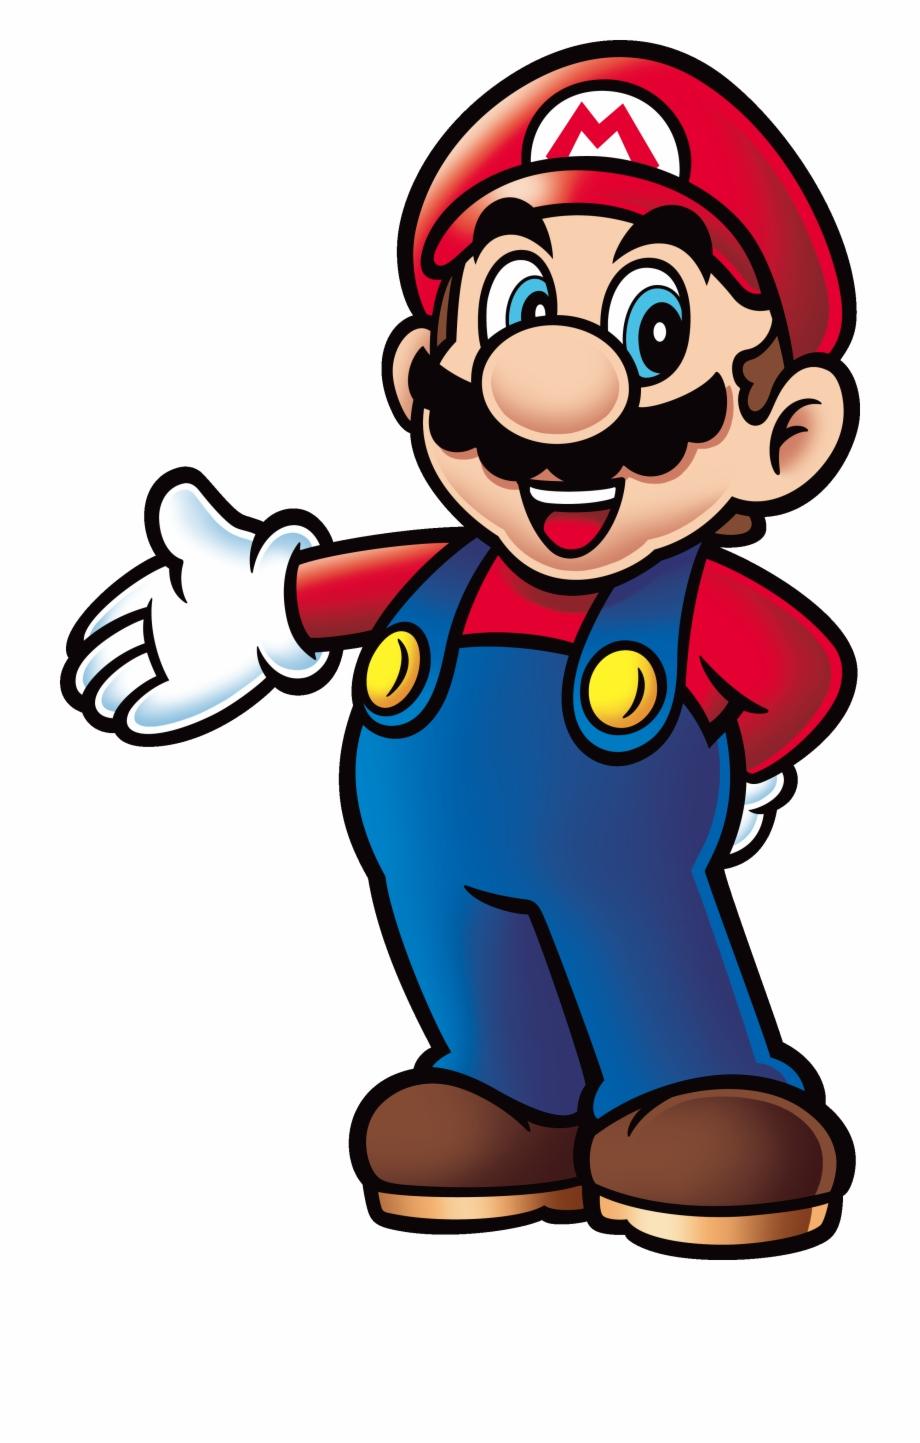 Super mario clipart download jpg transparent library Super Mario - Mario Clipart Png Free PNG Images & Clipart ... jpg transparent library